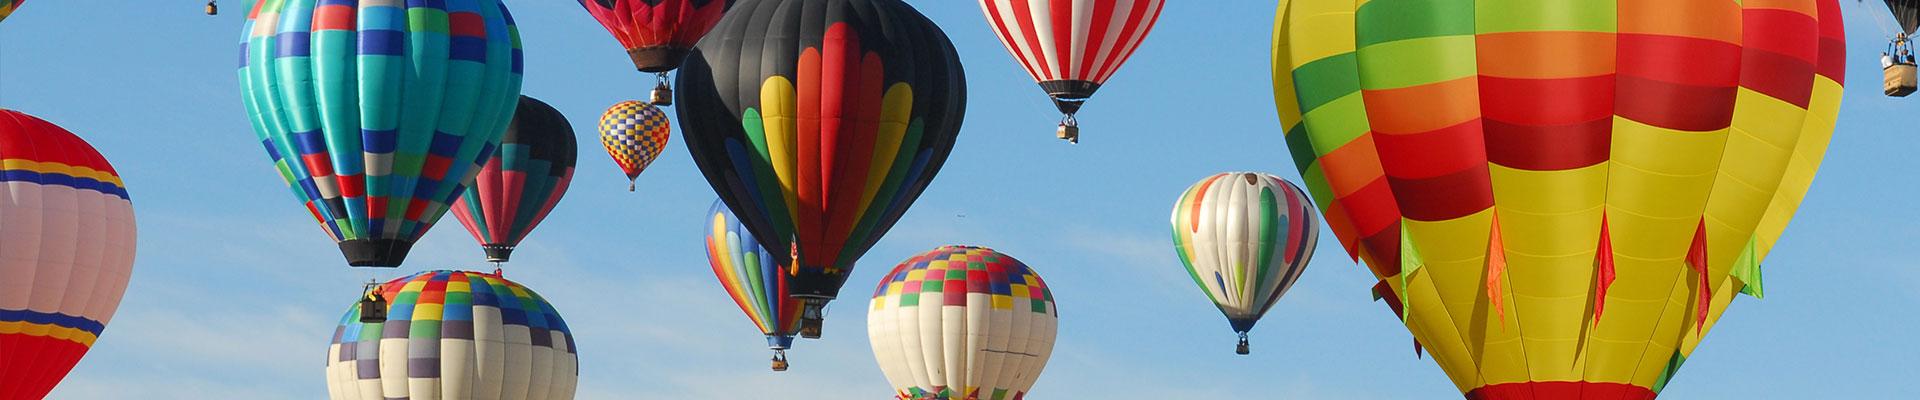 Fantasy RV Tours: 8 Day Albuquerque Balloon Fiesta (08UABW-100120)